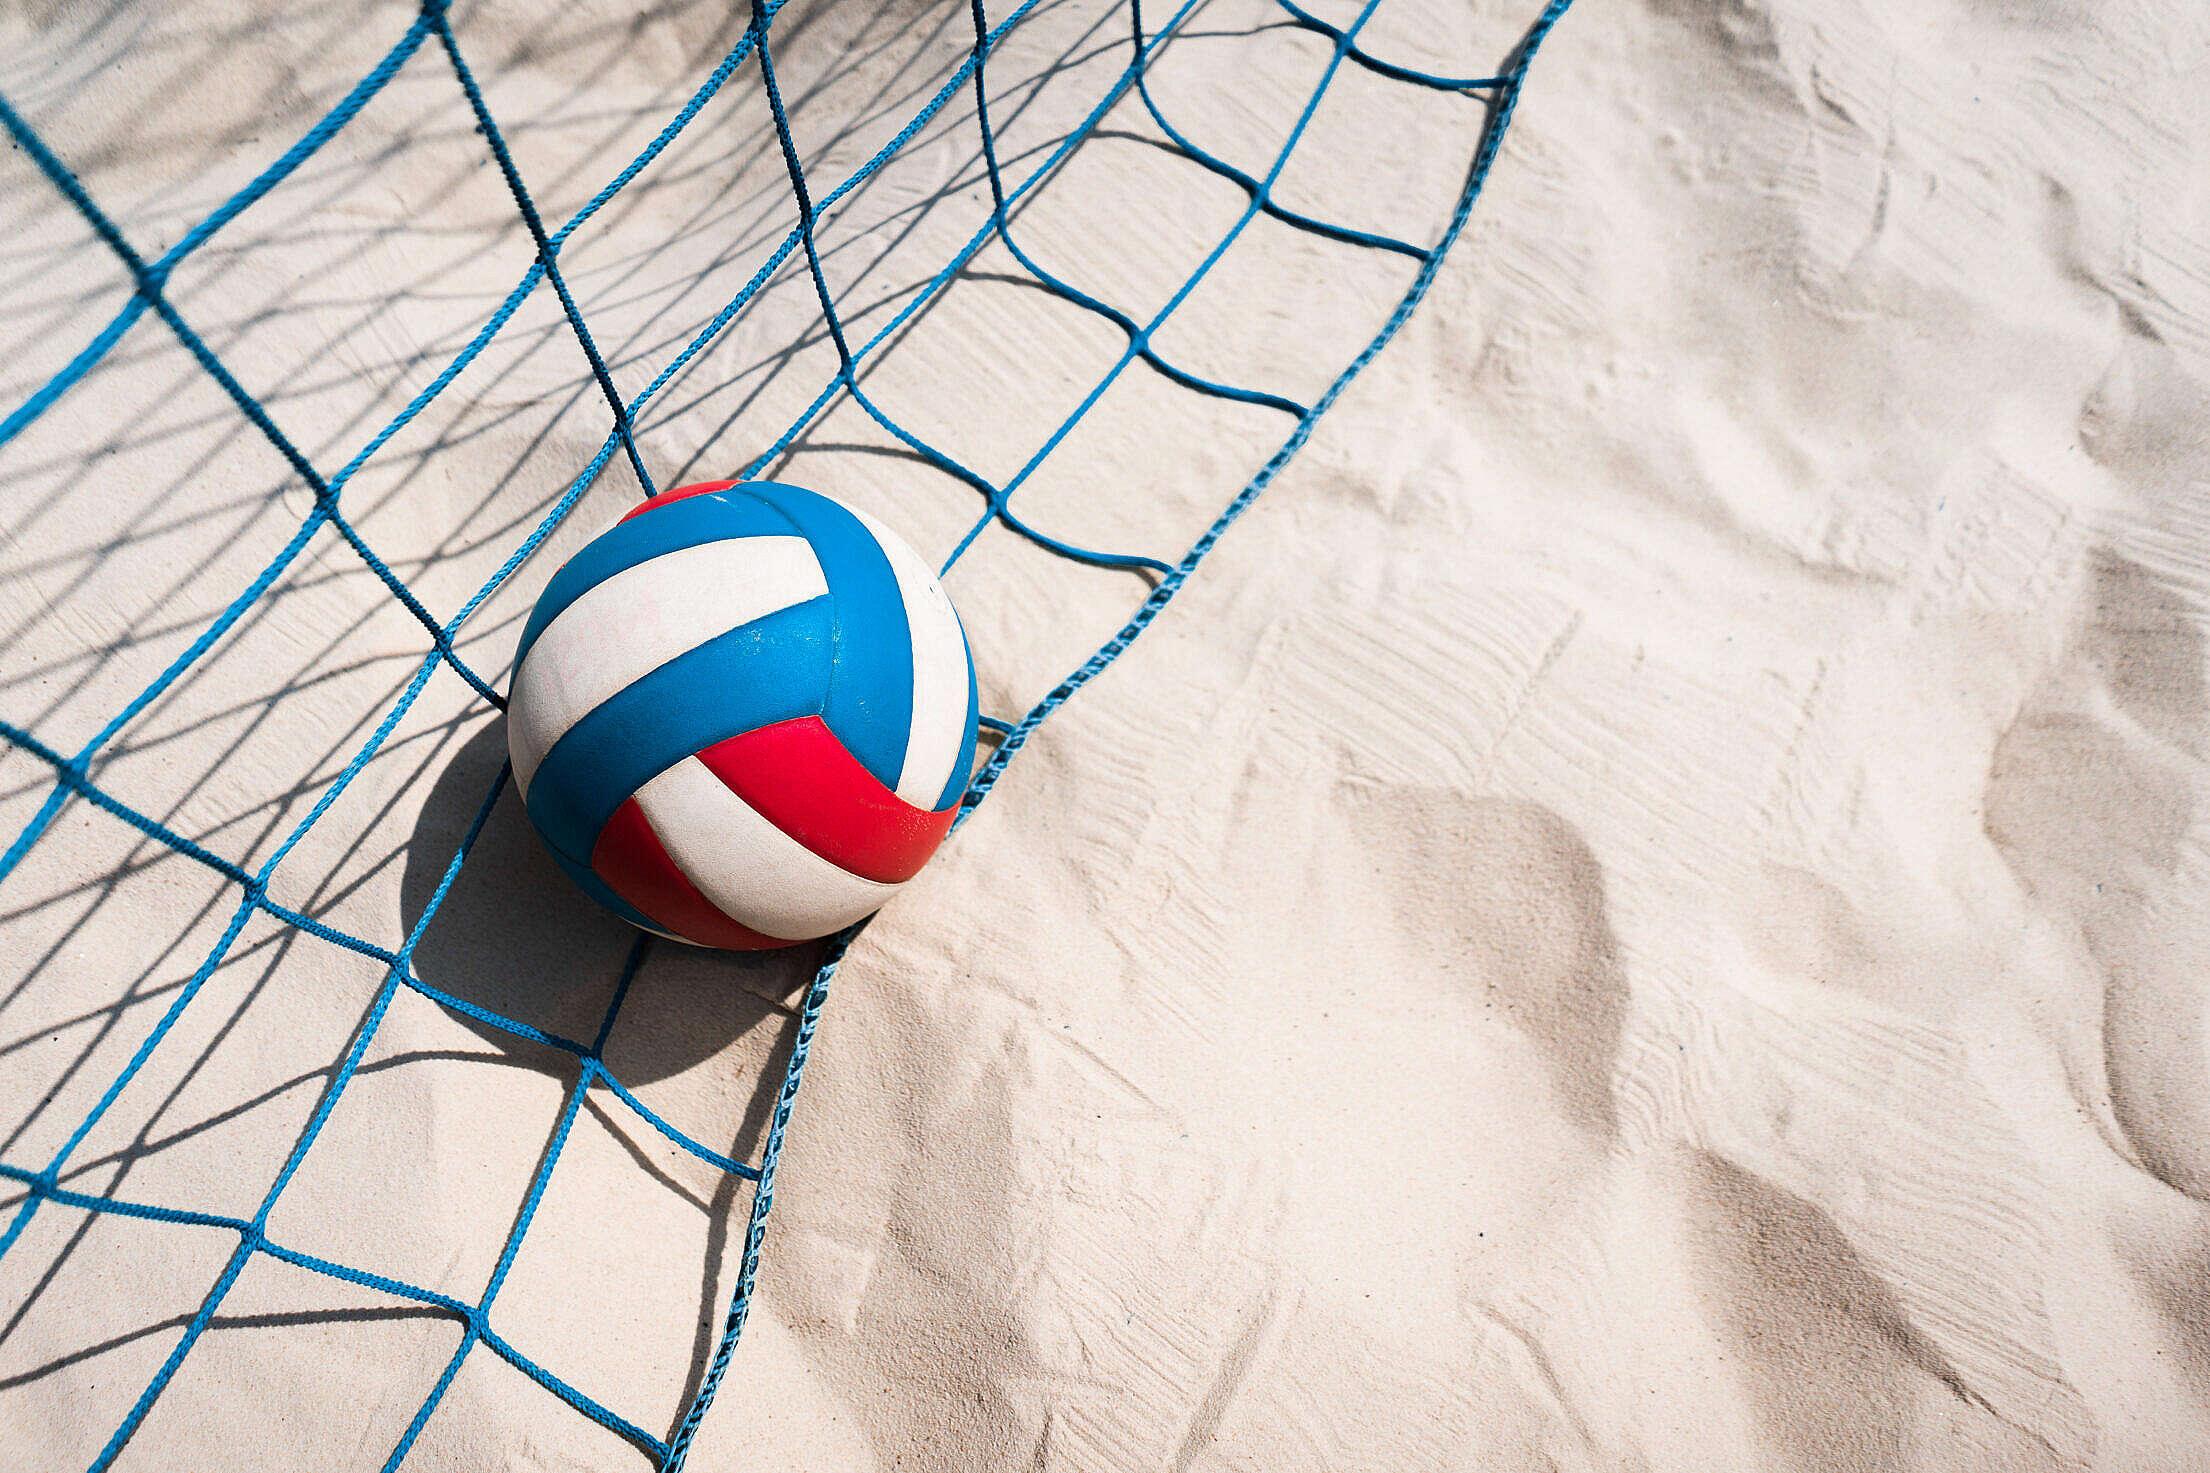 Beach Volleyball Free Stock Photo